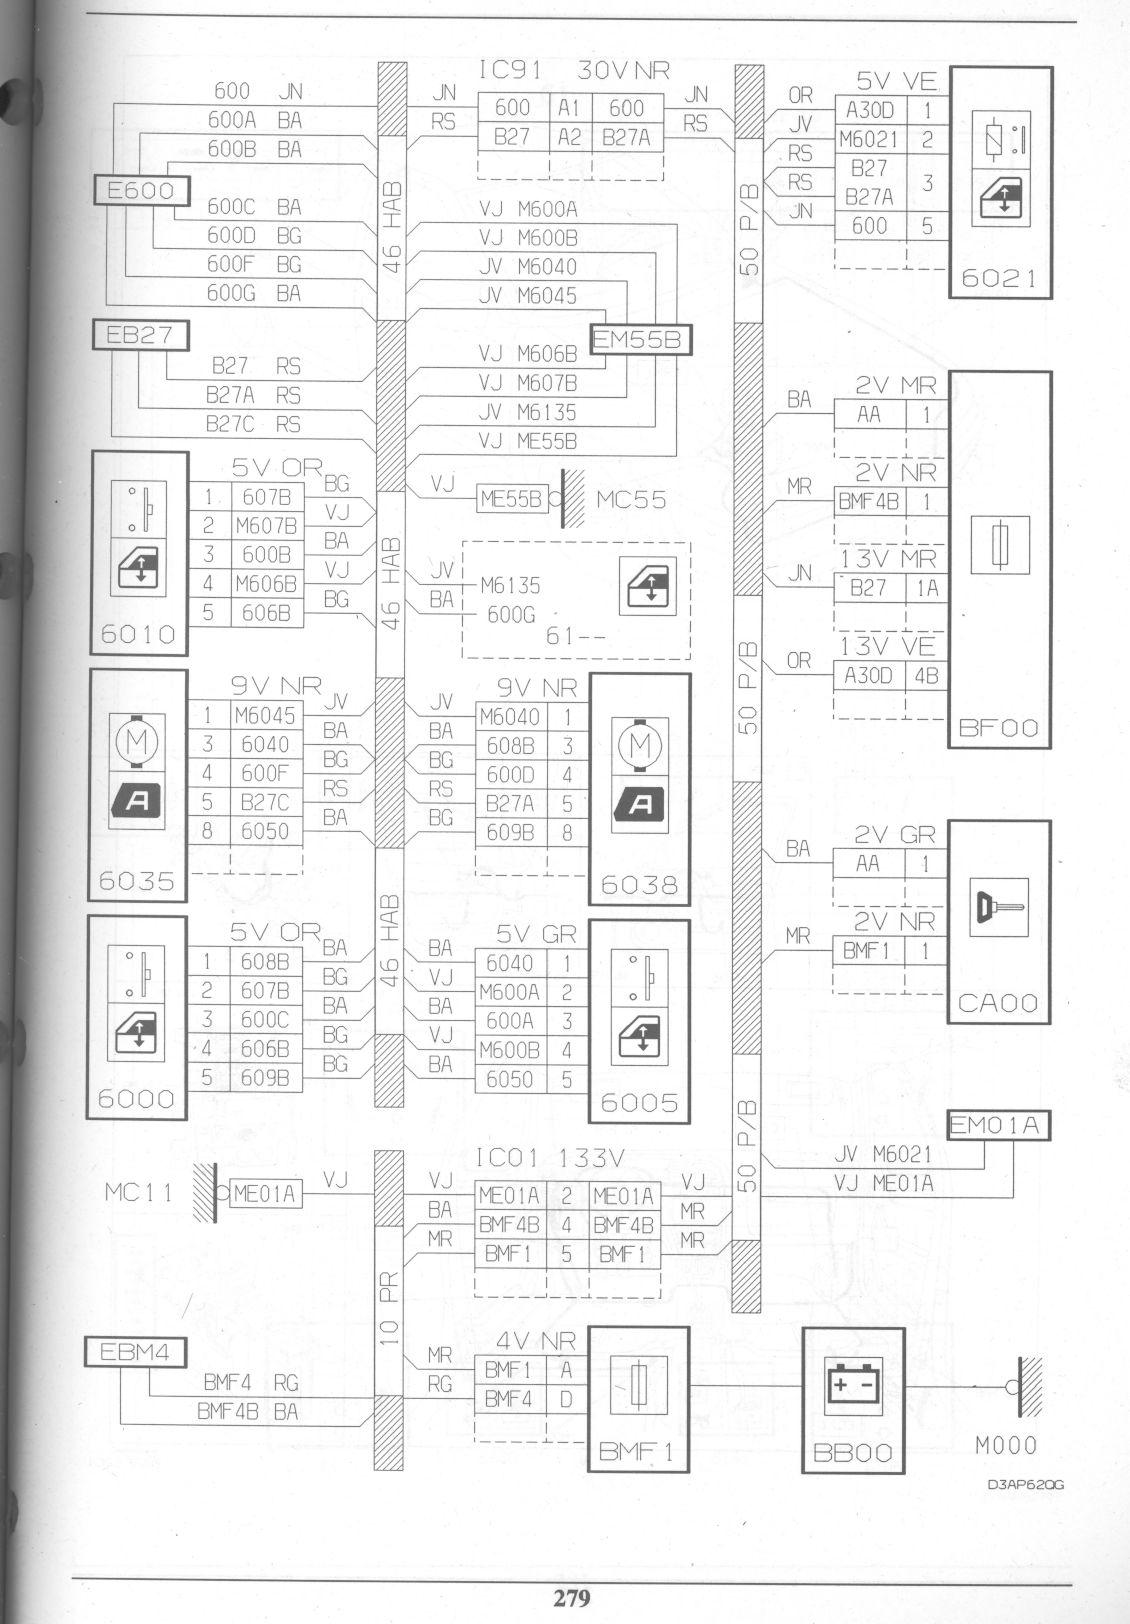 Citroen Berlingo Central Locking Wiring Diagram Trusted Bsi Relay 3 Diagrams U2022 Coffre